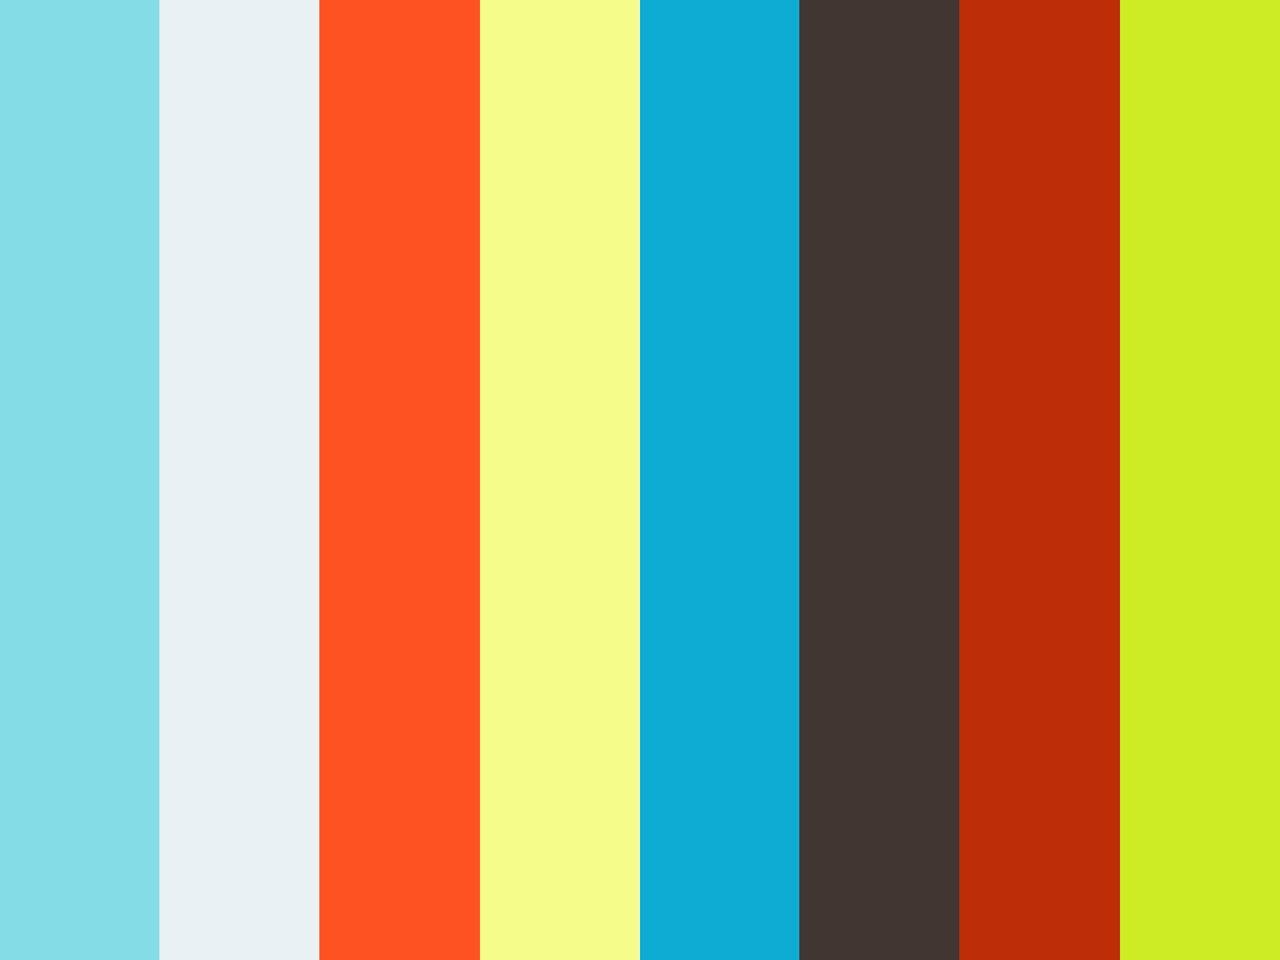 Segui L'onda - Smoking Blu Reggae [MUSIC VIDEO]